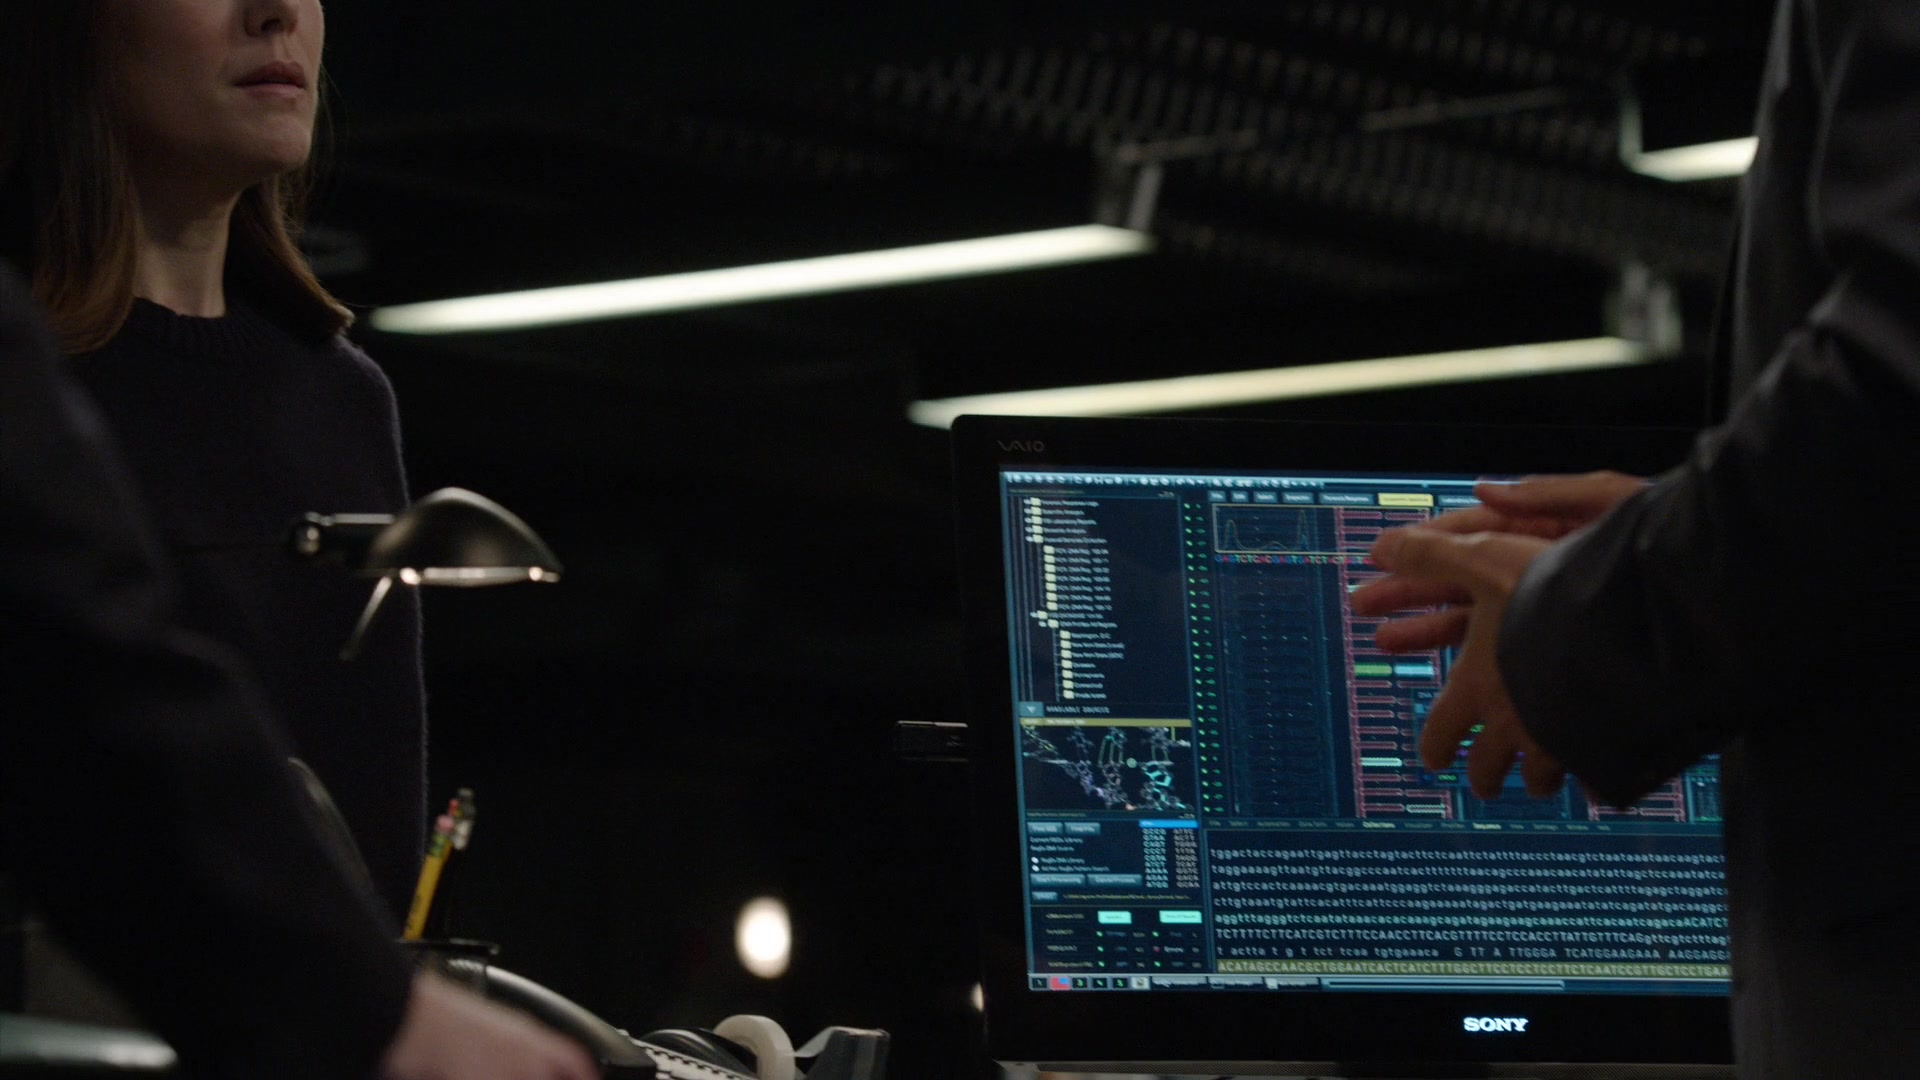 Sony Computer in The Blacklist - Season 6, Episode 20